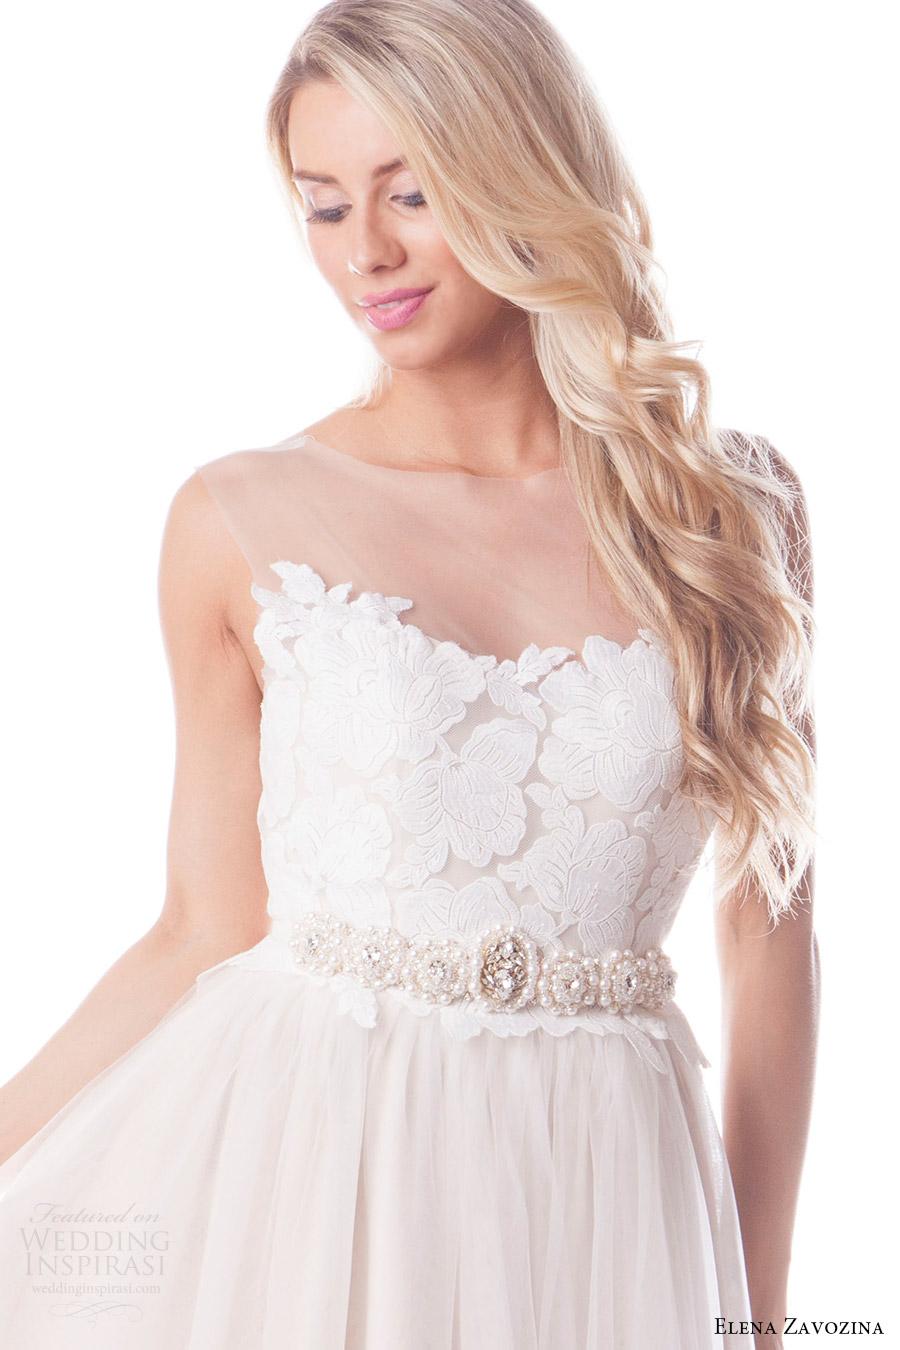 elena zavozina bridal accessories 2016 wedding pearl belt (elena) fv